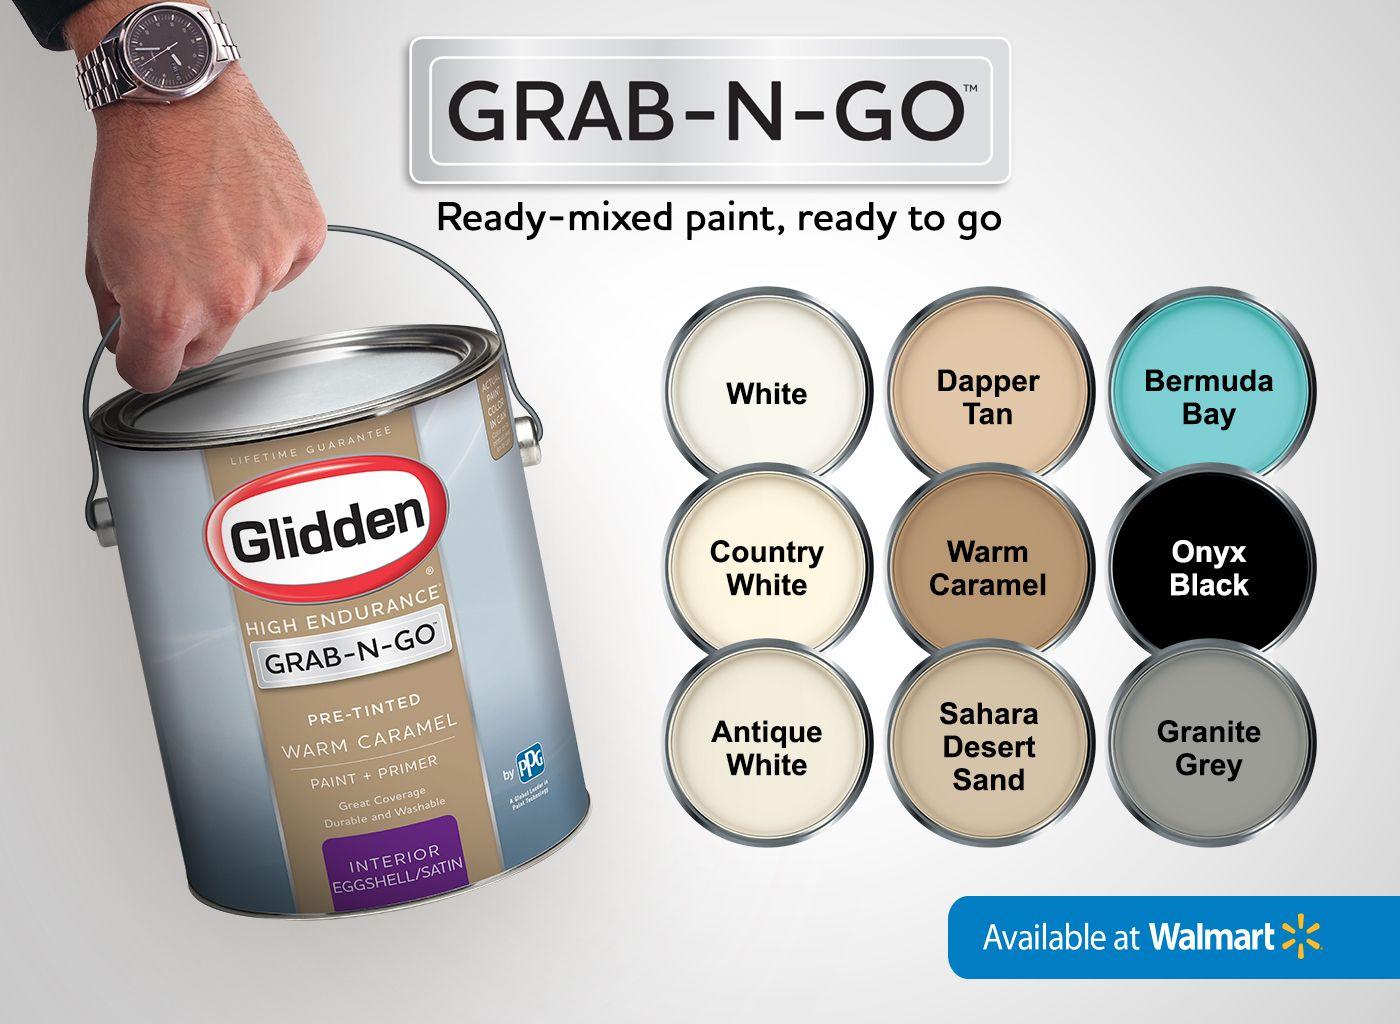 Glidden Pre Mixed Ready To Use Interior Paint And Primer Warm Caramel Walmart Com Walmart Paint Colors Walmart Paint Glidden Paint Colors